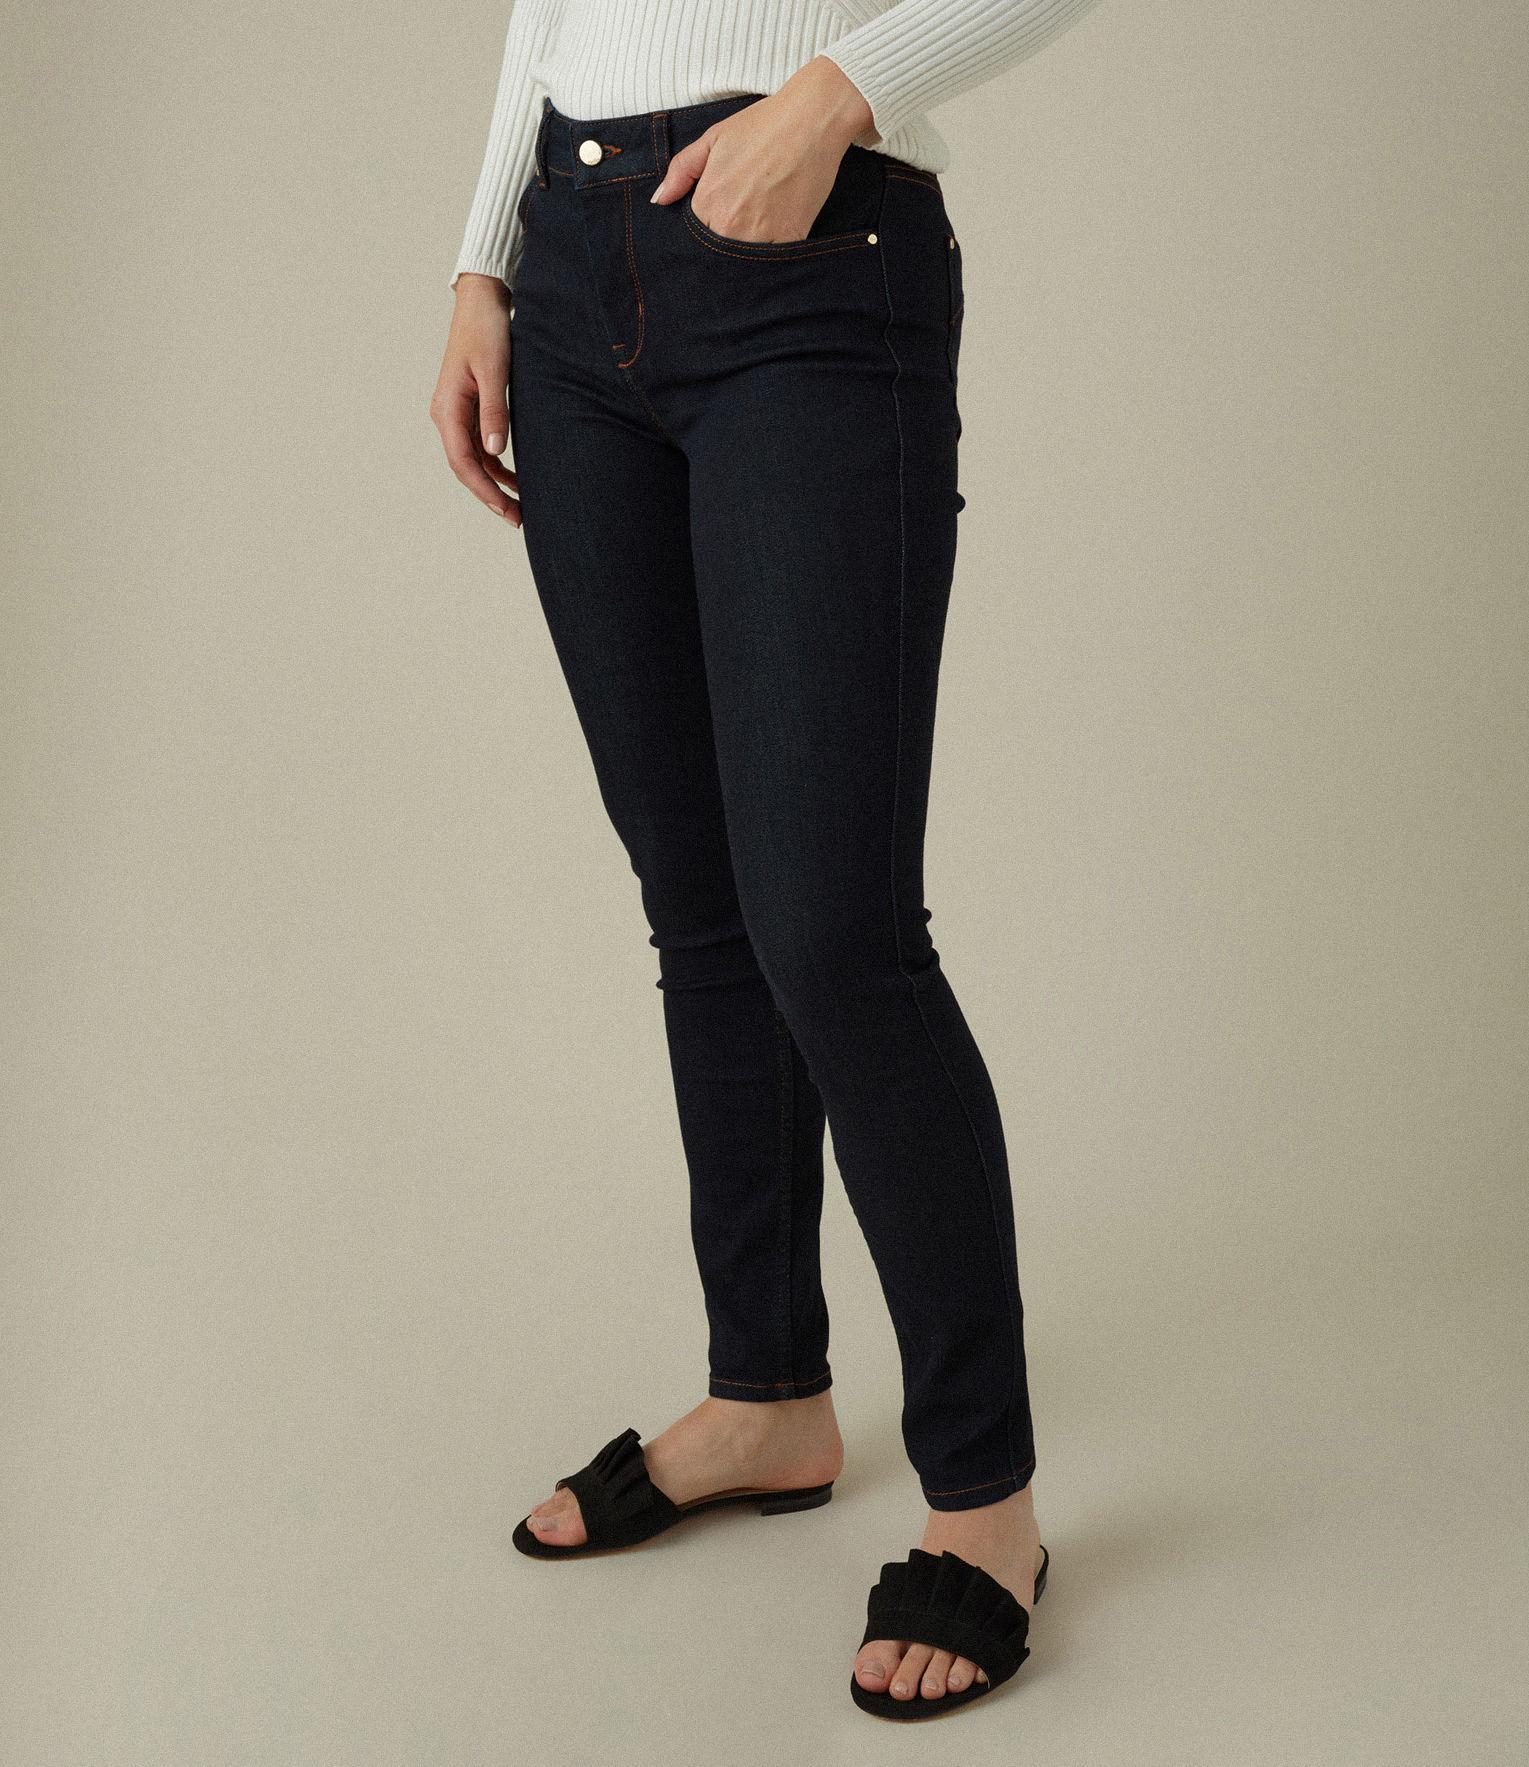 Karen Millen Denim Signature Skinny Jeans in Denim (Blue)